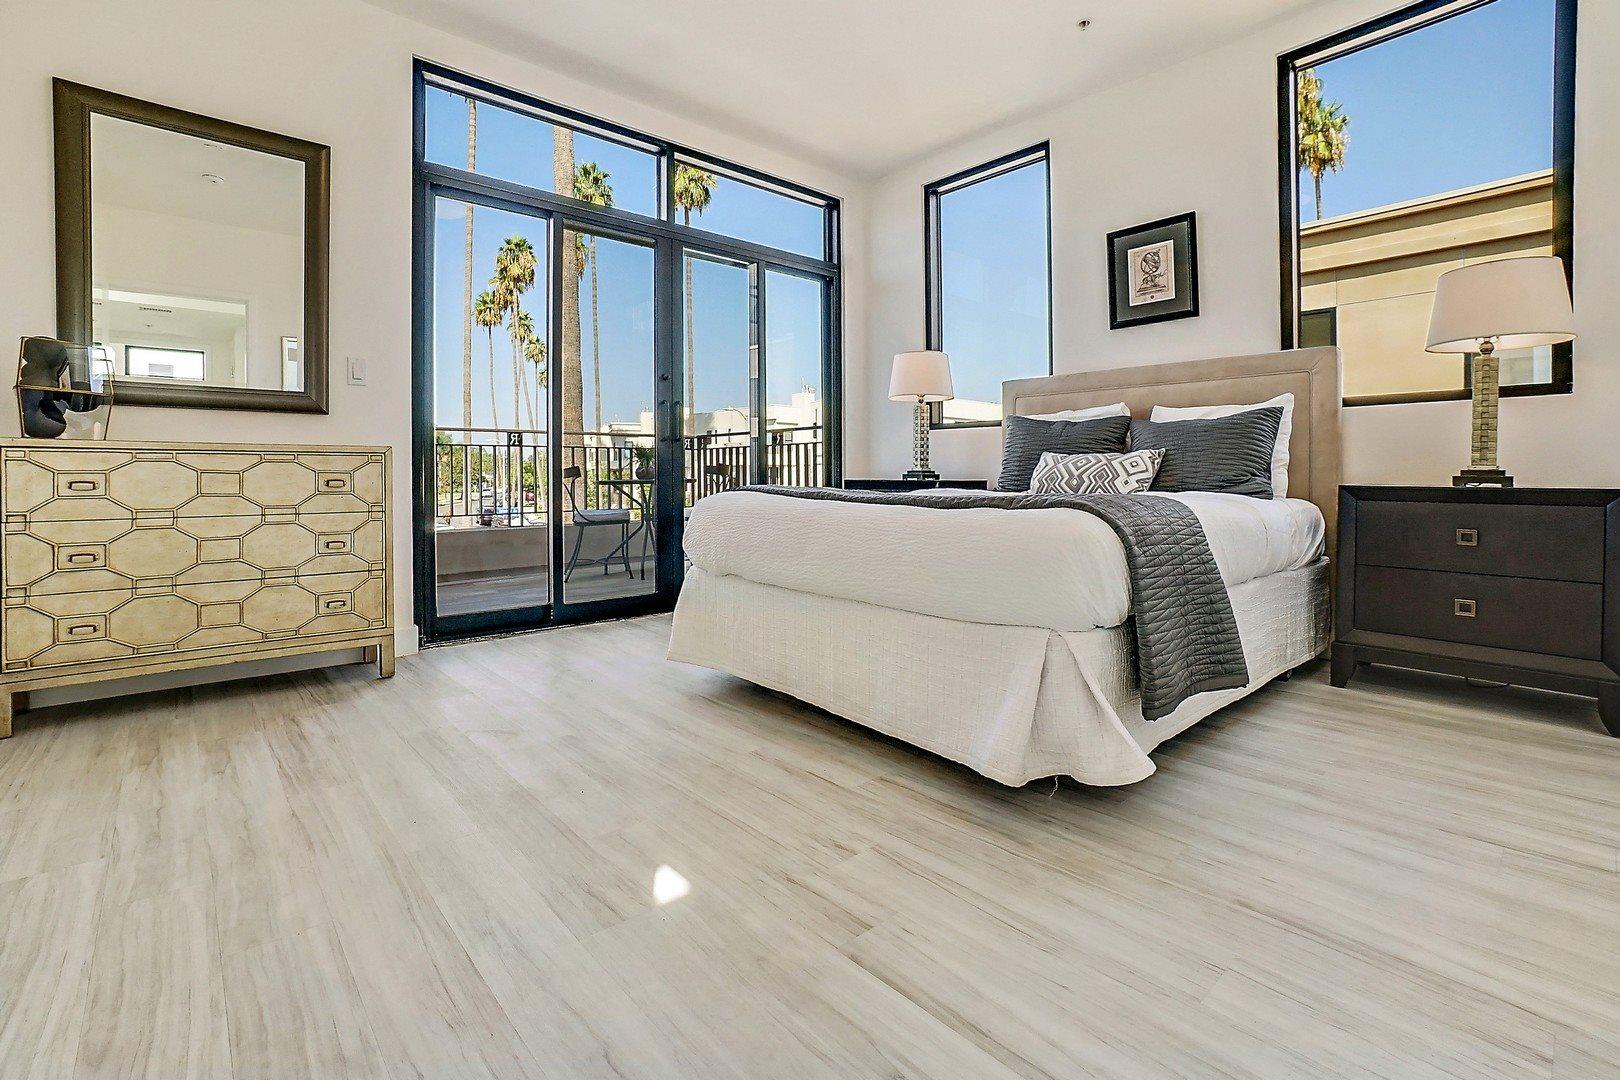 Two Bedroom Apartments in Tarzana CA - The Residences at Village Walk Bedroom